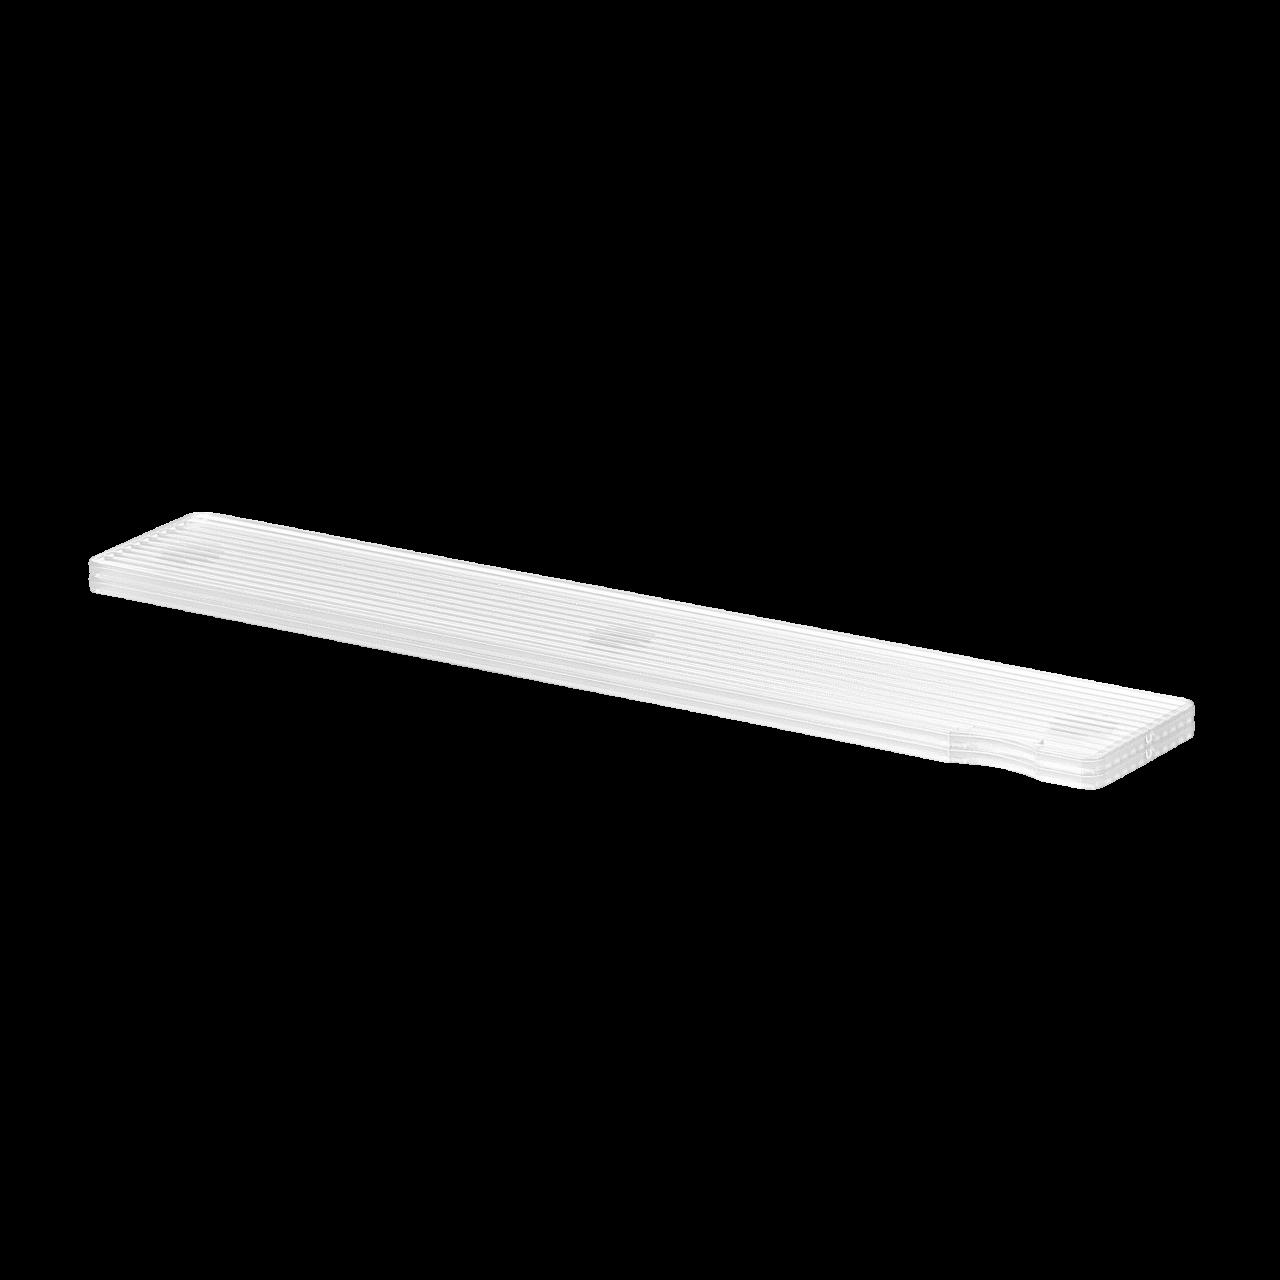 Kunststoff-Profifeilen Jumbo, weiß ohne Feilblätter, 10 Stck.